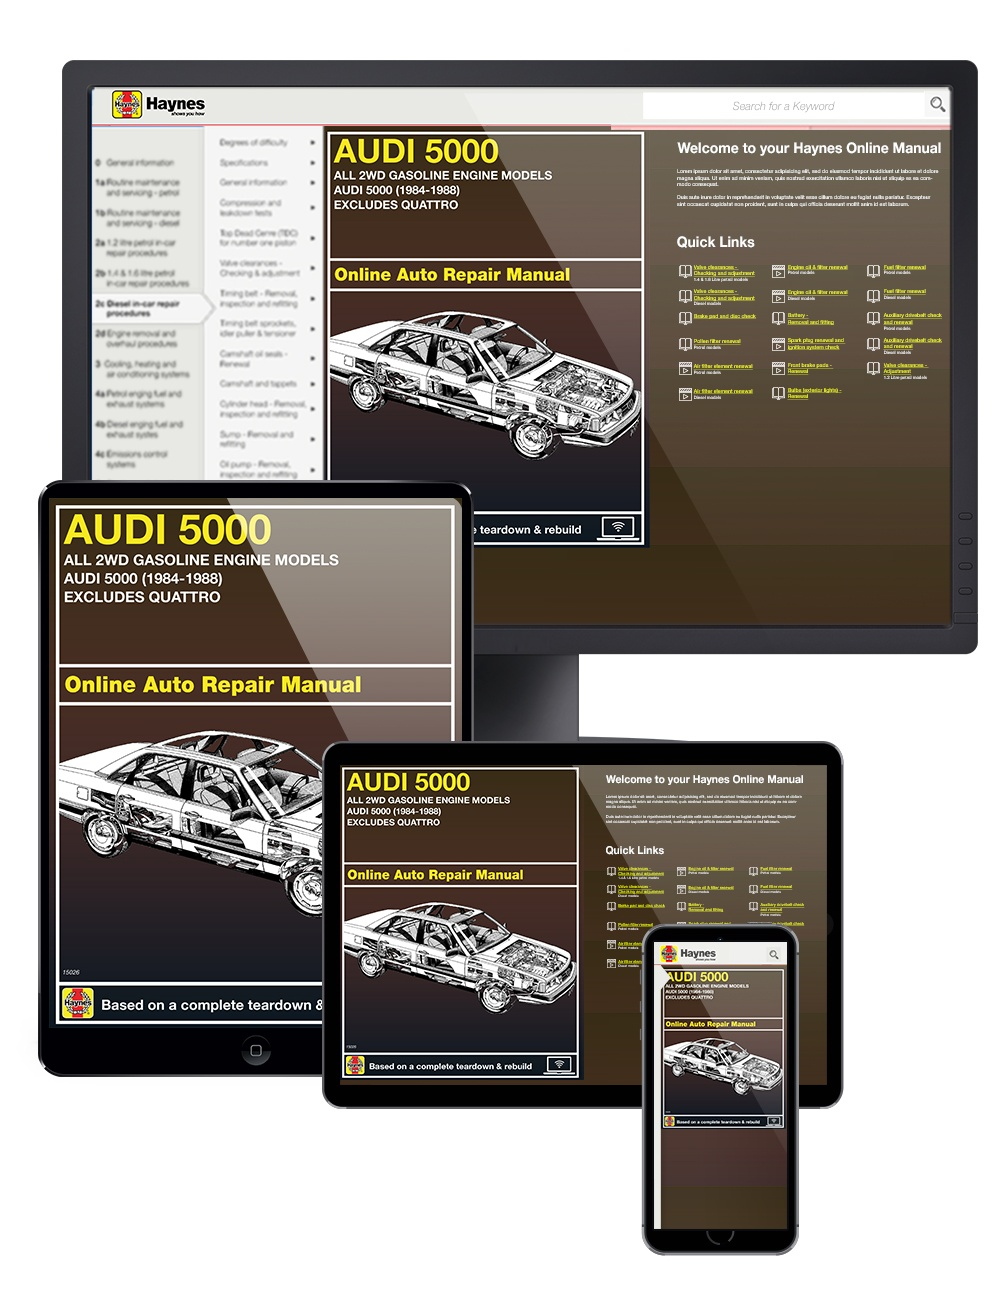 Audi 5000 2WD Gas Engine models (84-88) Haynes Online Manual